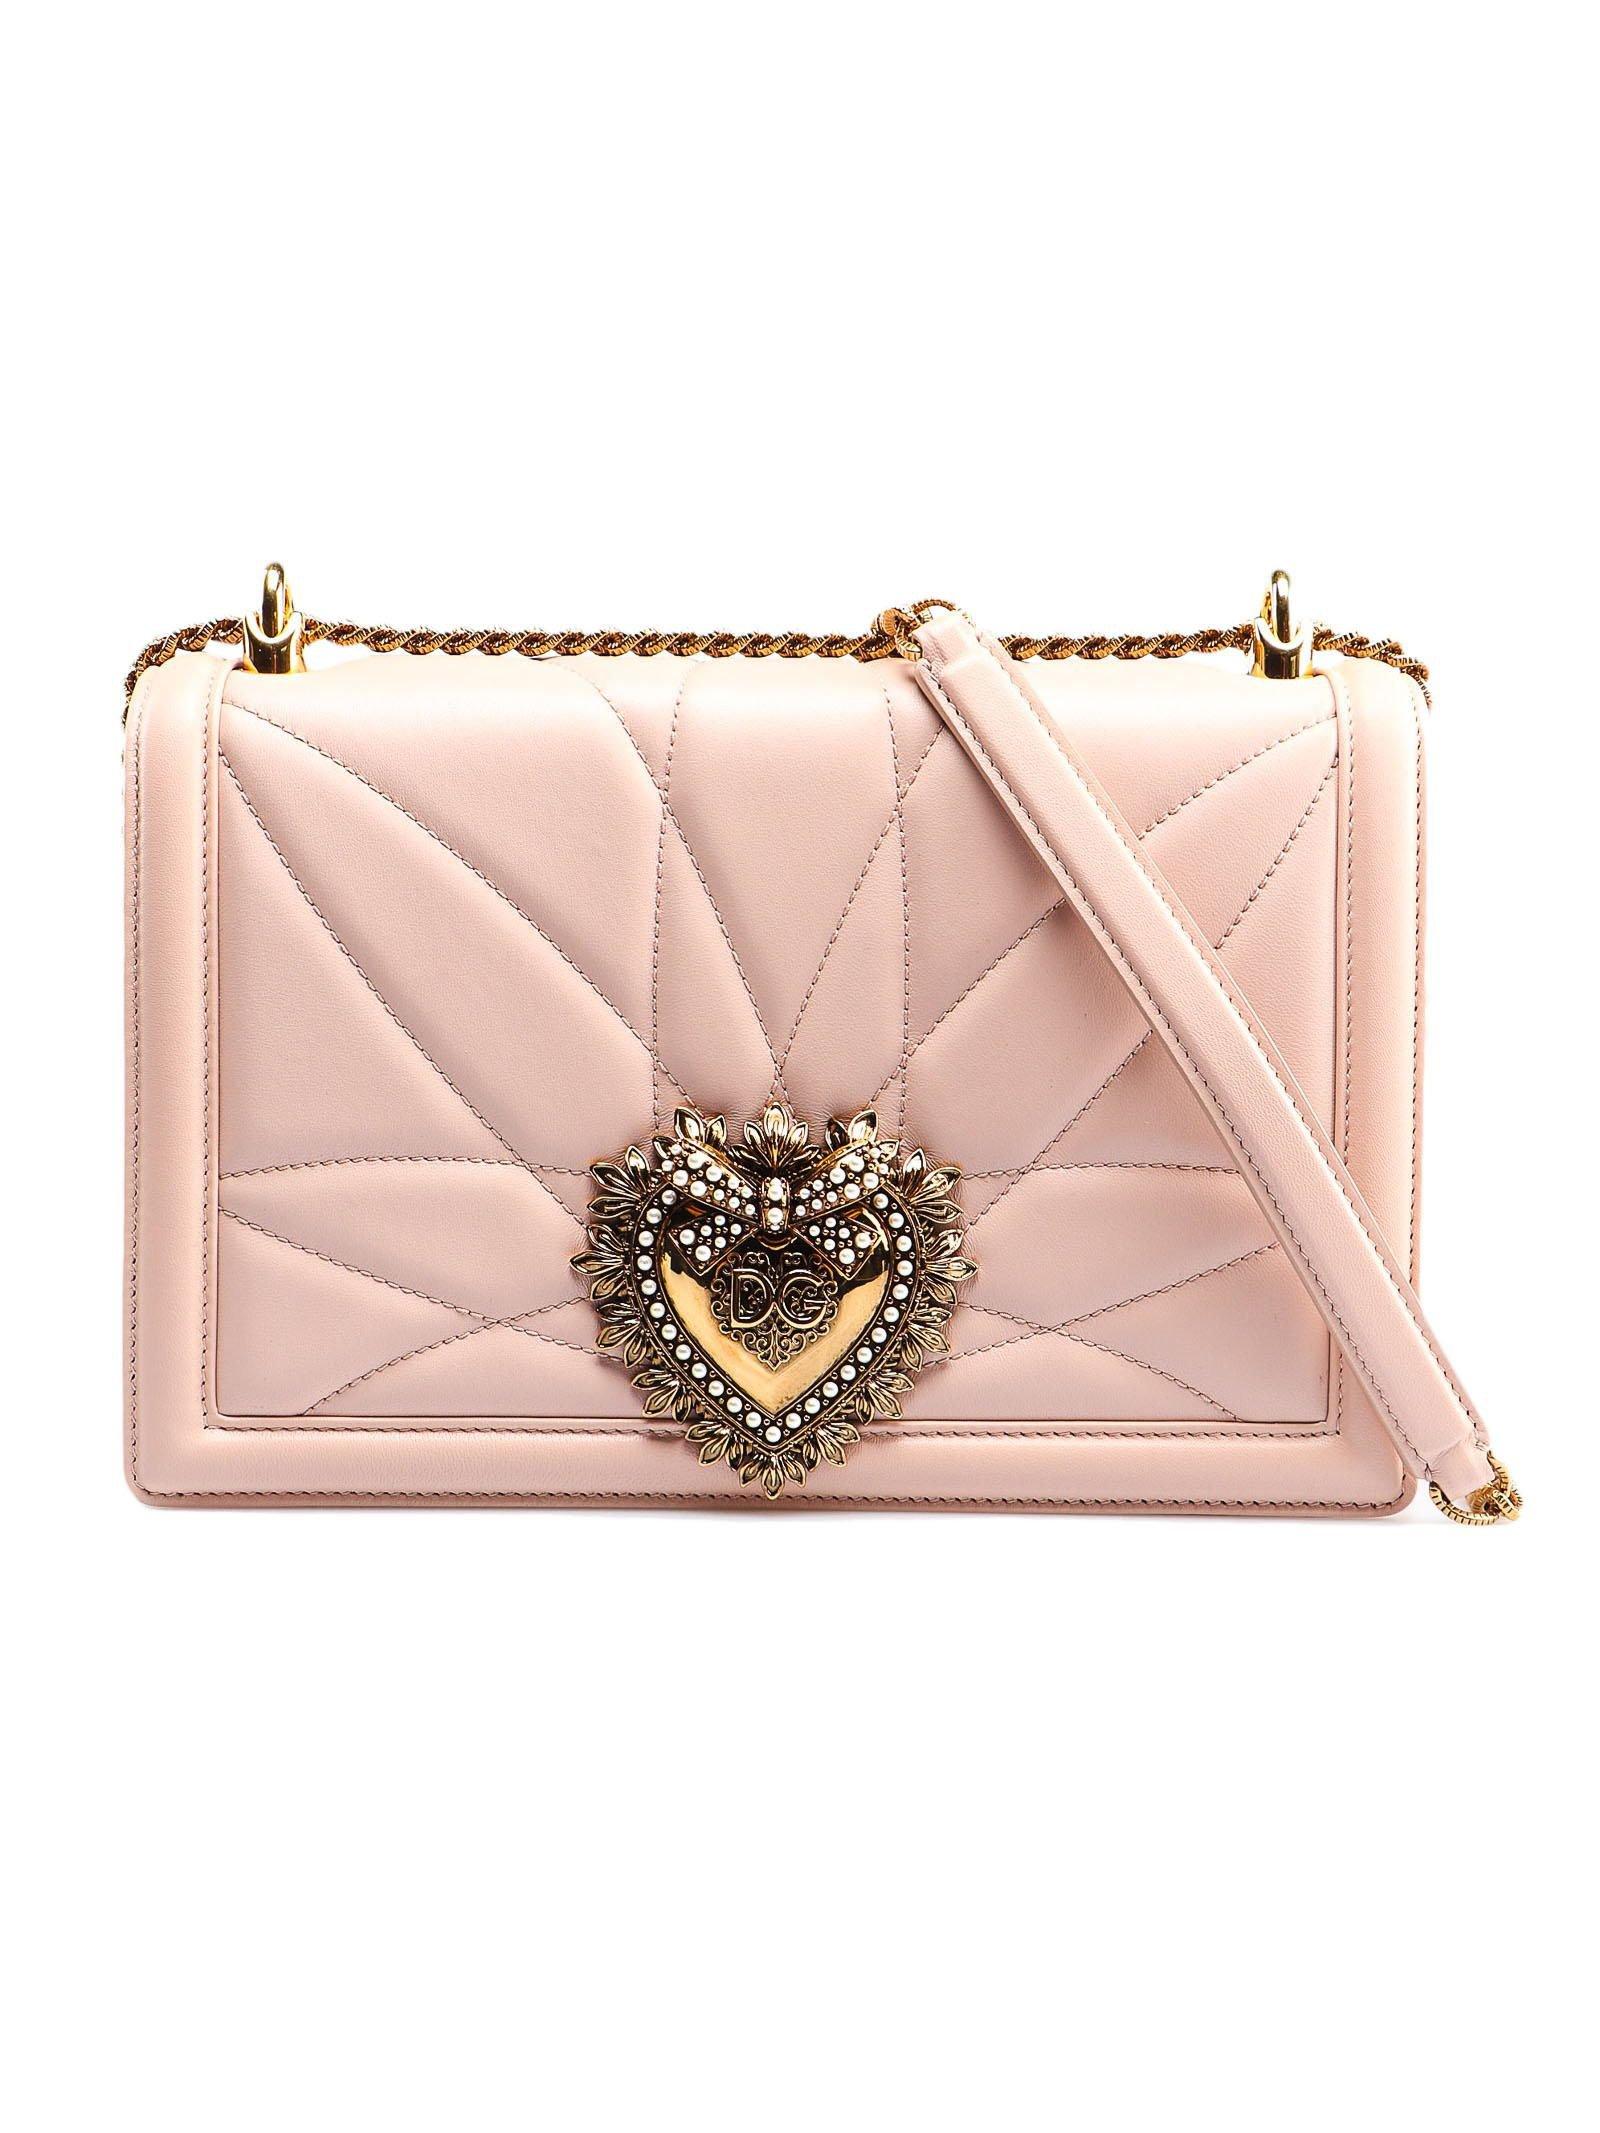 Dolce & Gabbana Lg Devotion Bag